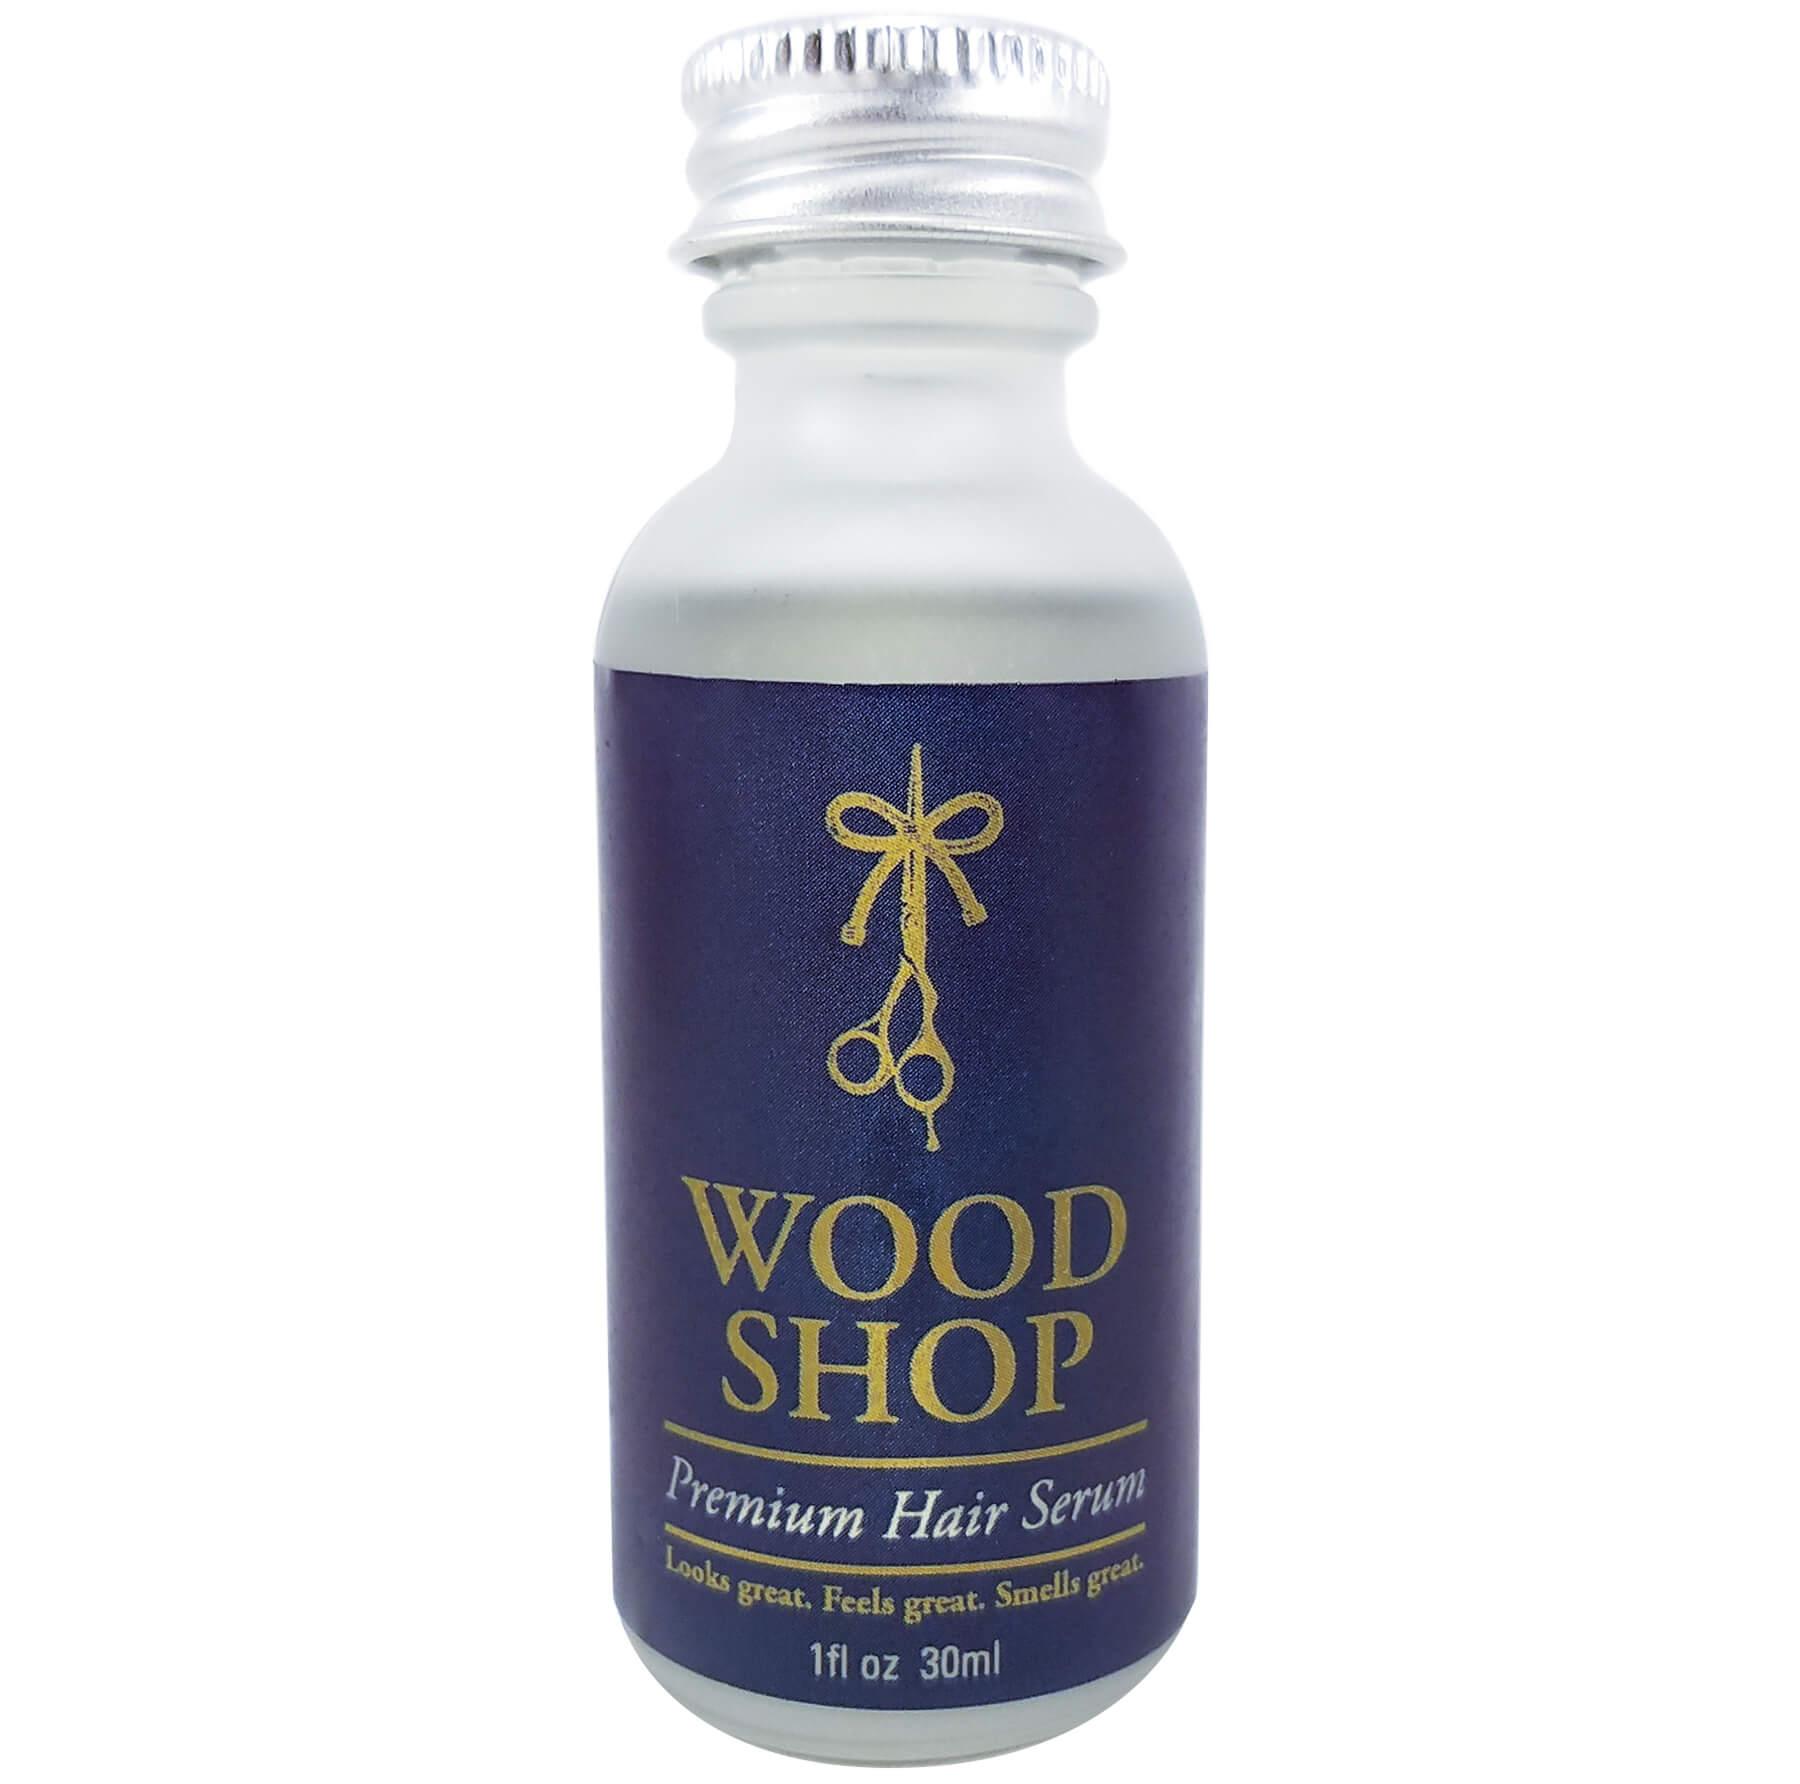 Wood Shop Hair Serum